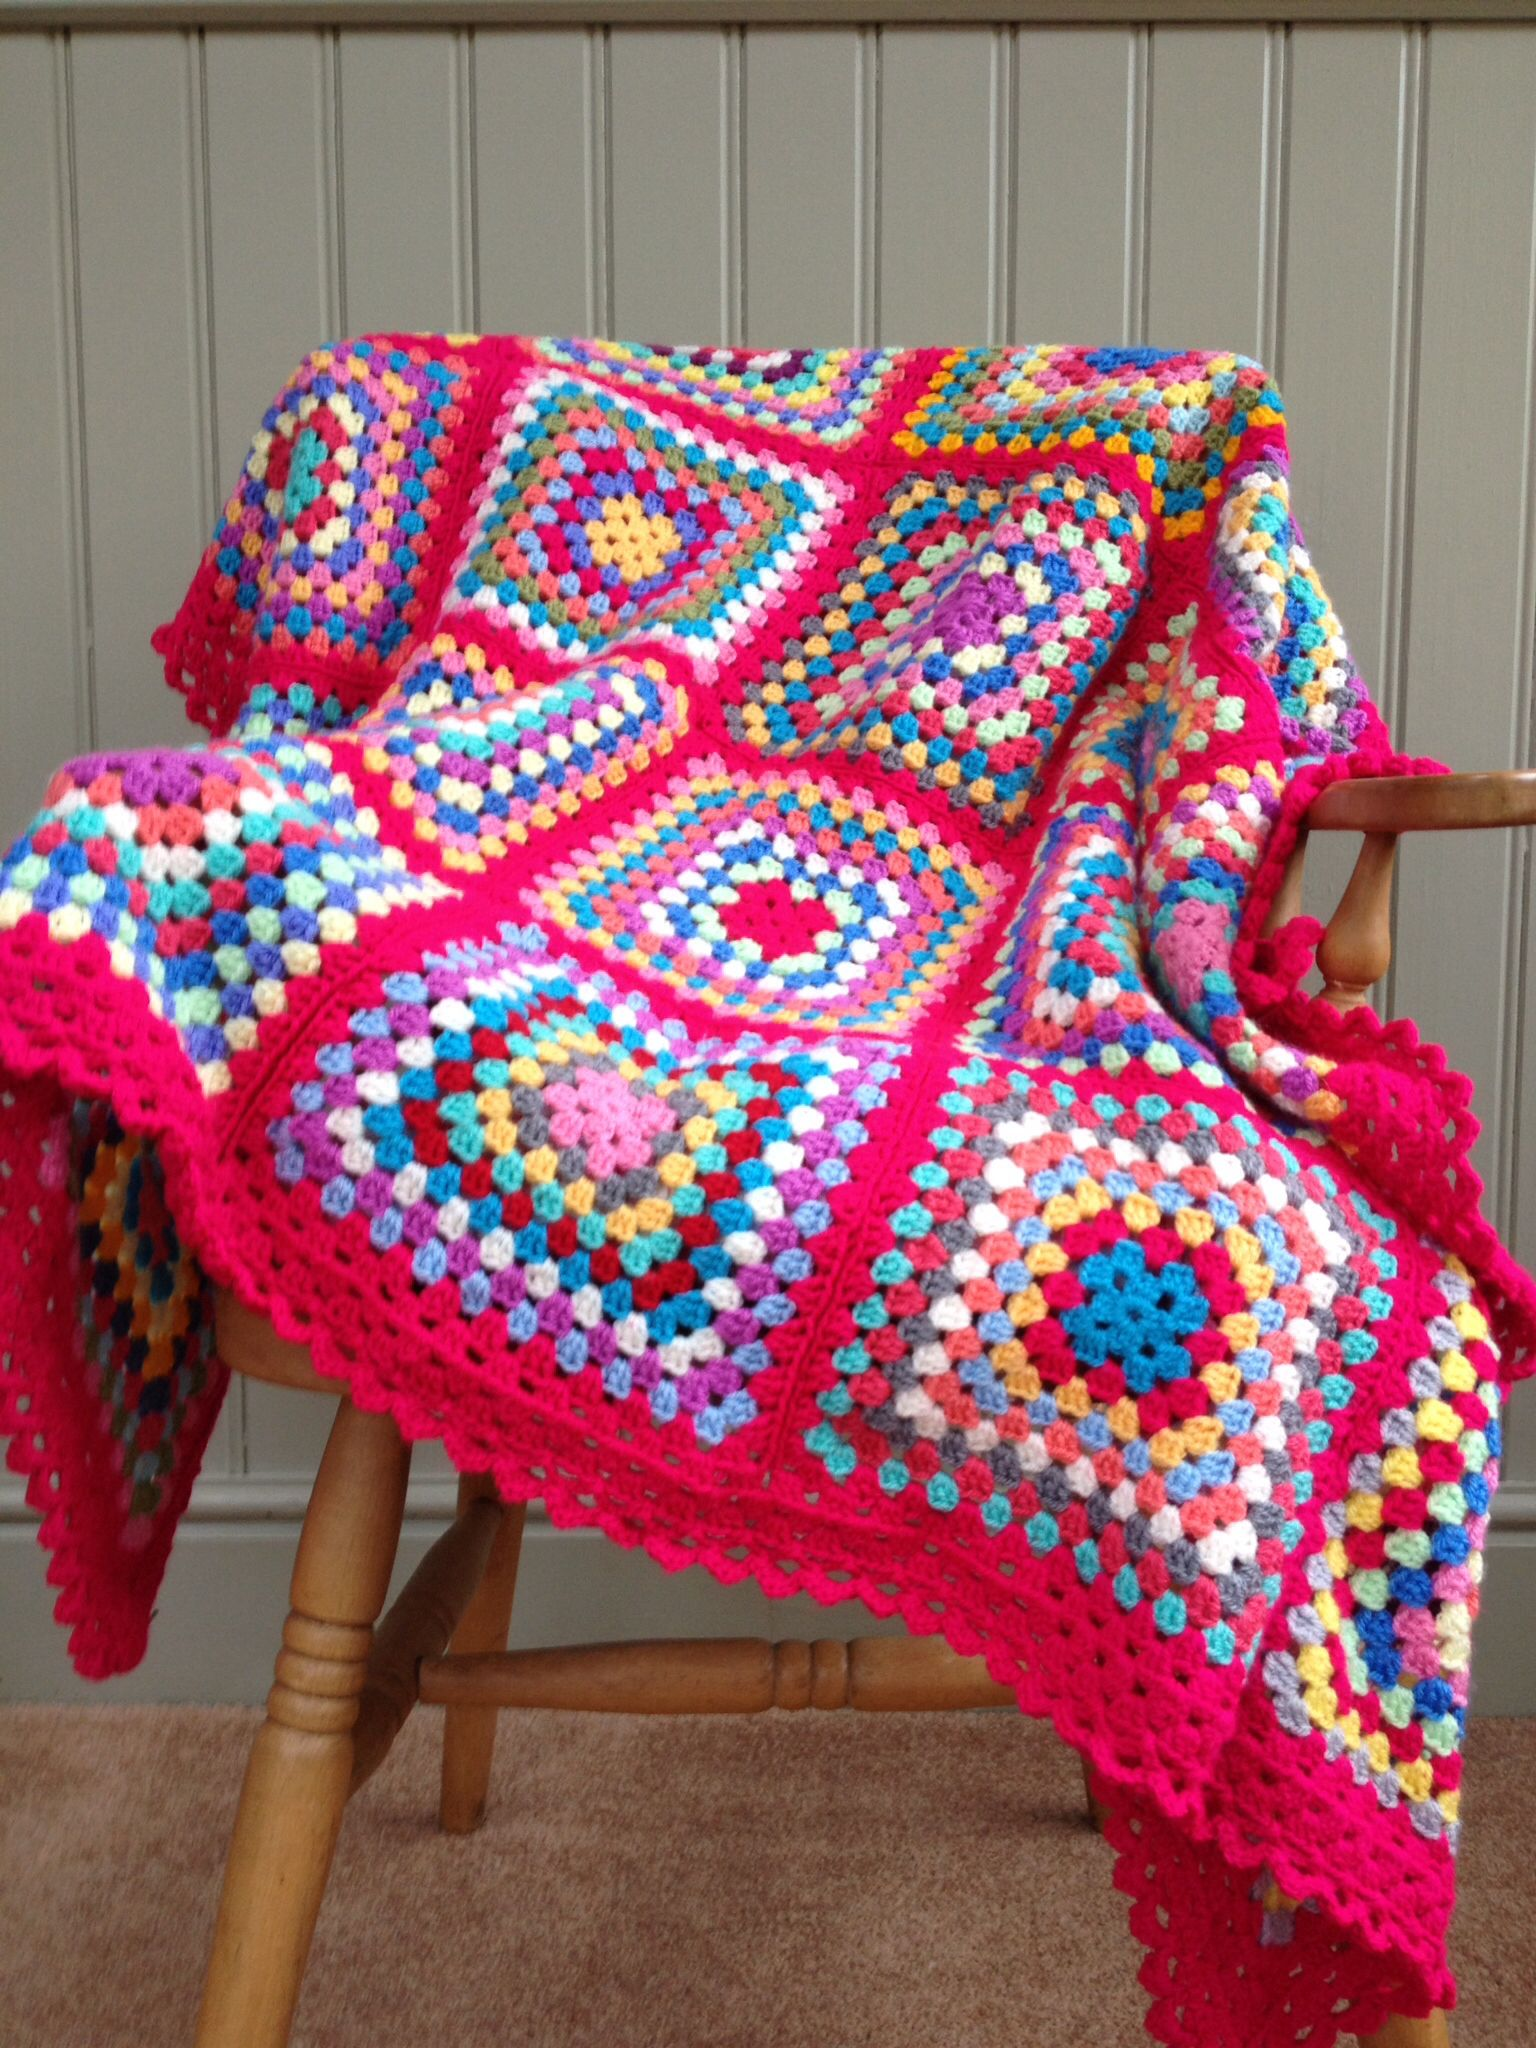 I Made A Crochet Blanket For Joanna S New Home Edging Instructions From Attic 24 Jenny Hubbard Cobertores De Croche Trico E Croche Mantas De La